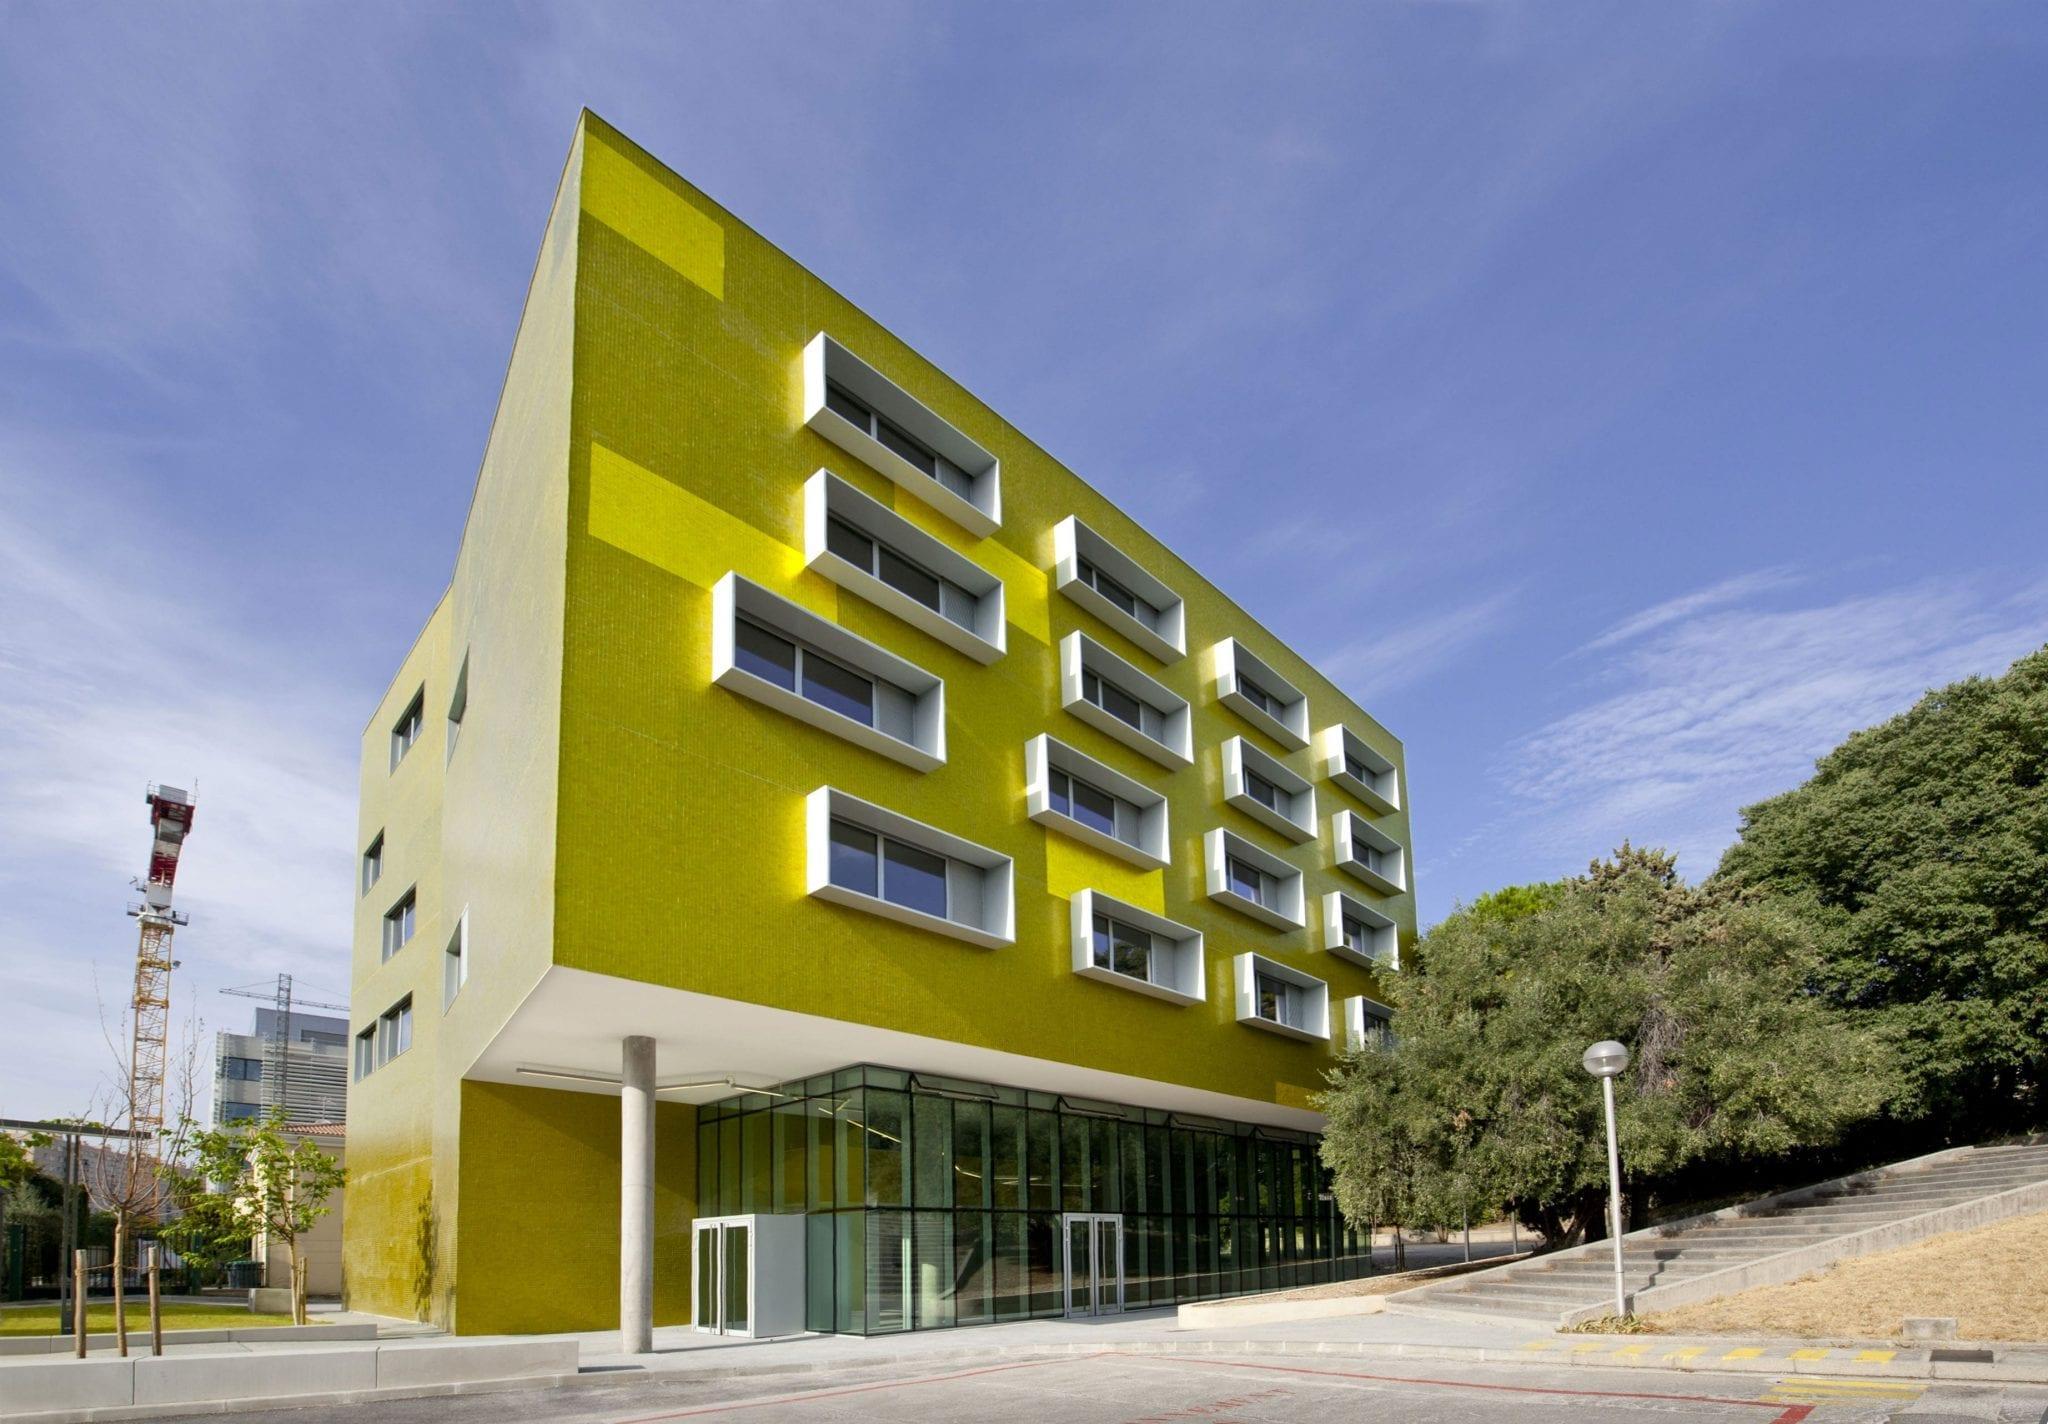 Le Campus de la Timone in Marseille France Slide